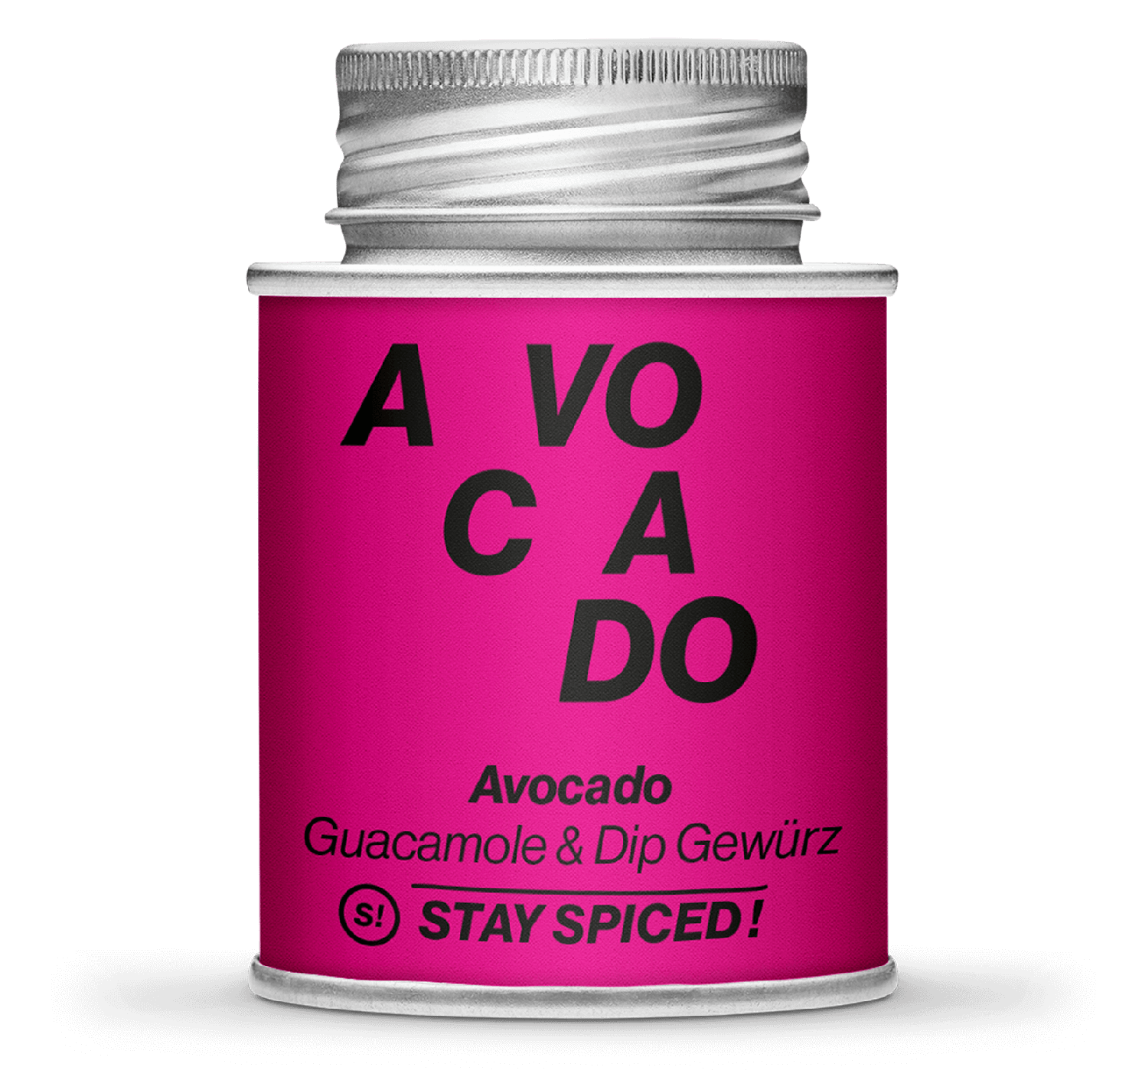 Gewürzzubereitung - Avocado - Guacamole &